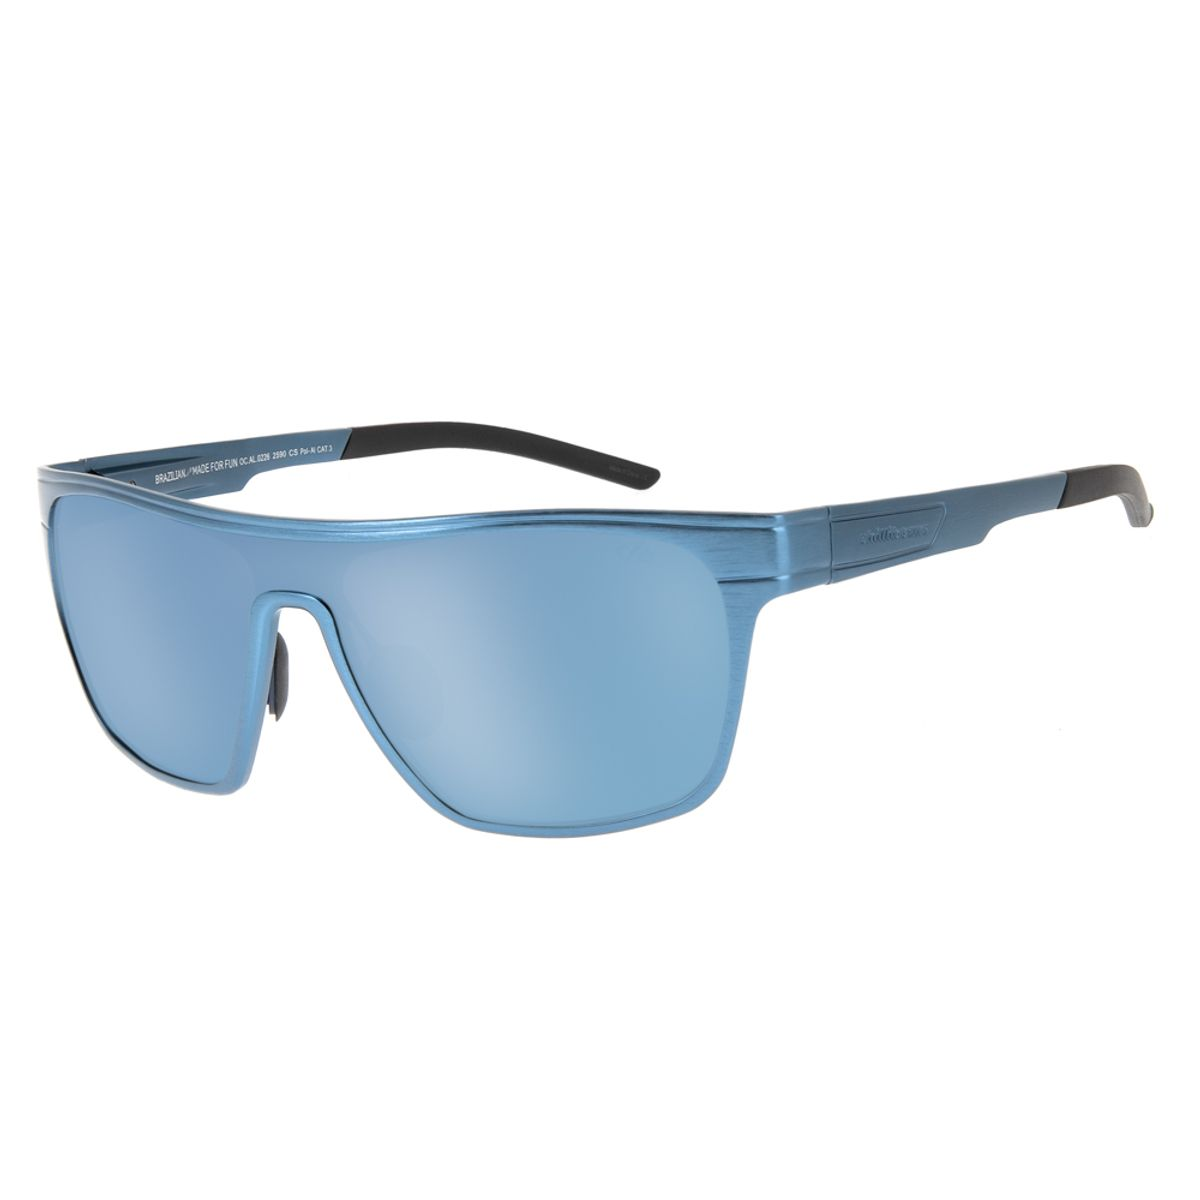 b0520c321 Óculos de Sol Esportivo Masculino Chilli Beans Polarizado Azul Escuro -  OC.AL.0226.2590 M. REF: OC.AL.0226.2590. OC.